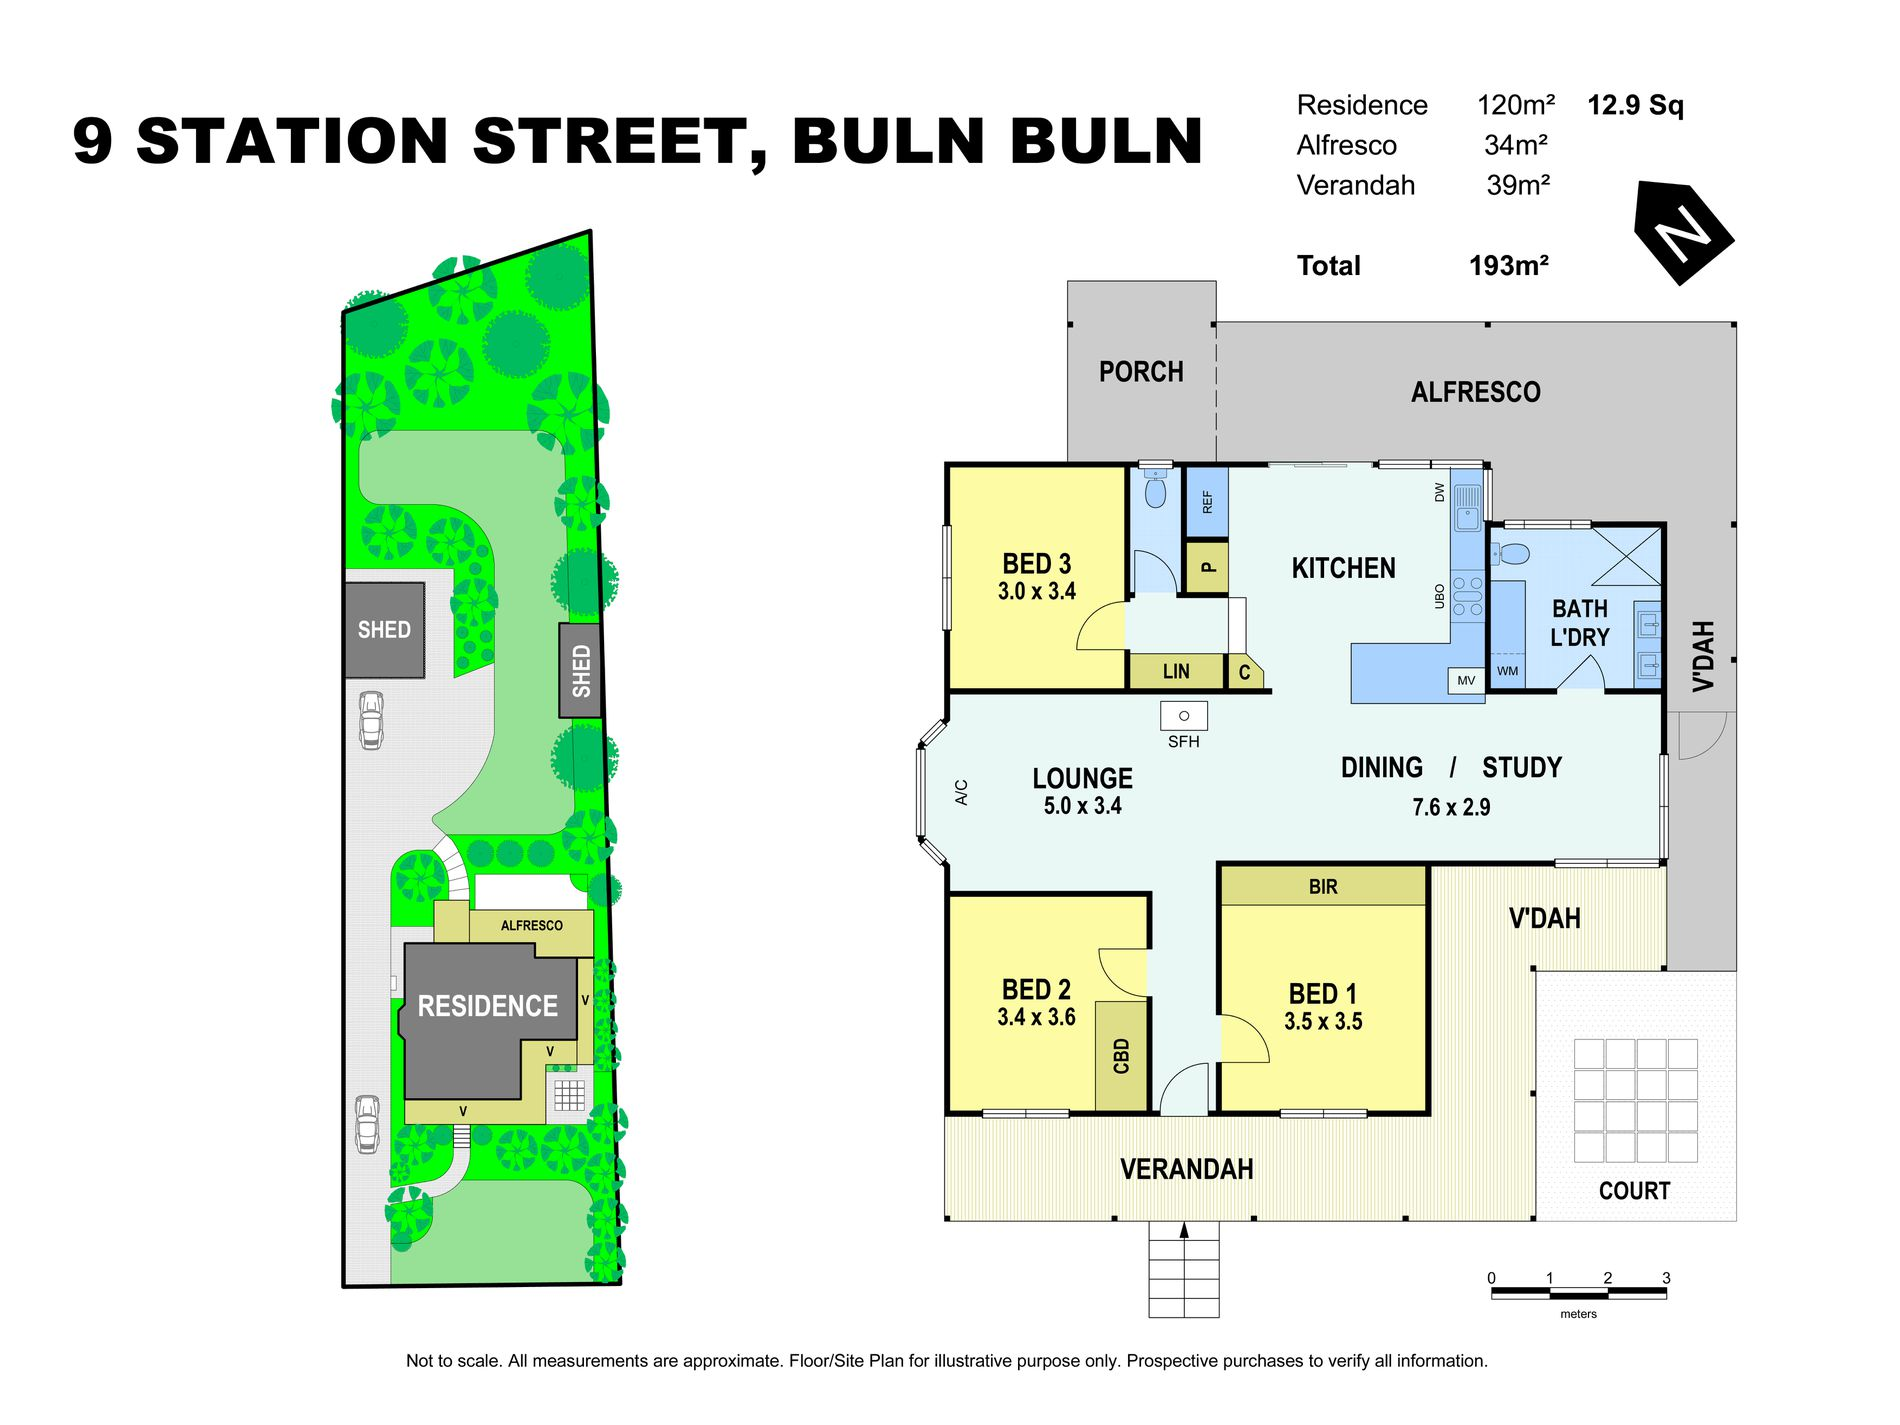 9 Station Street, Buln Buln